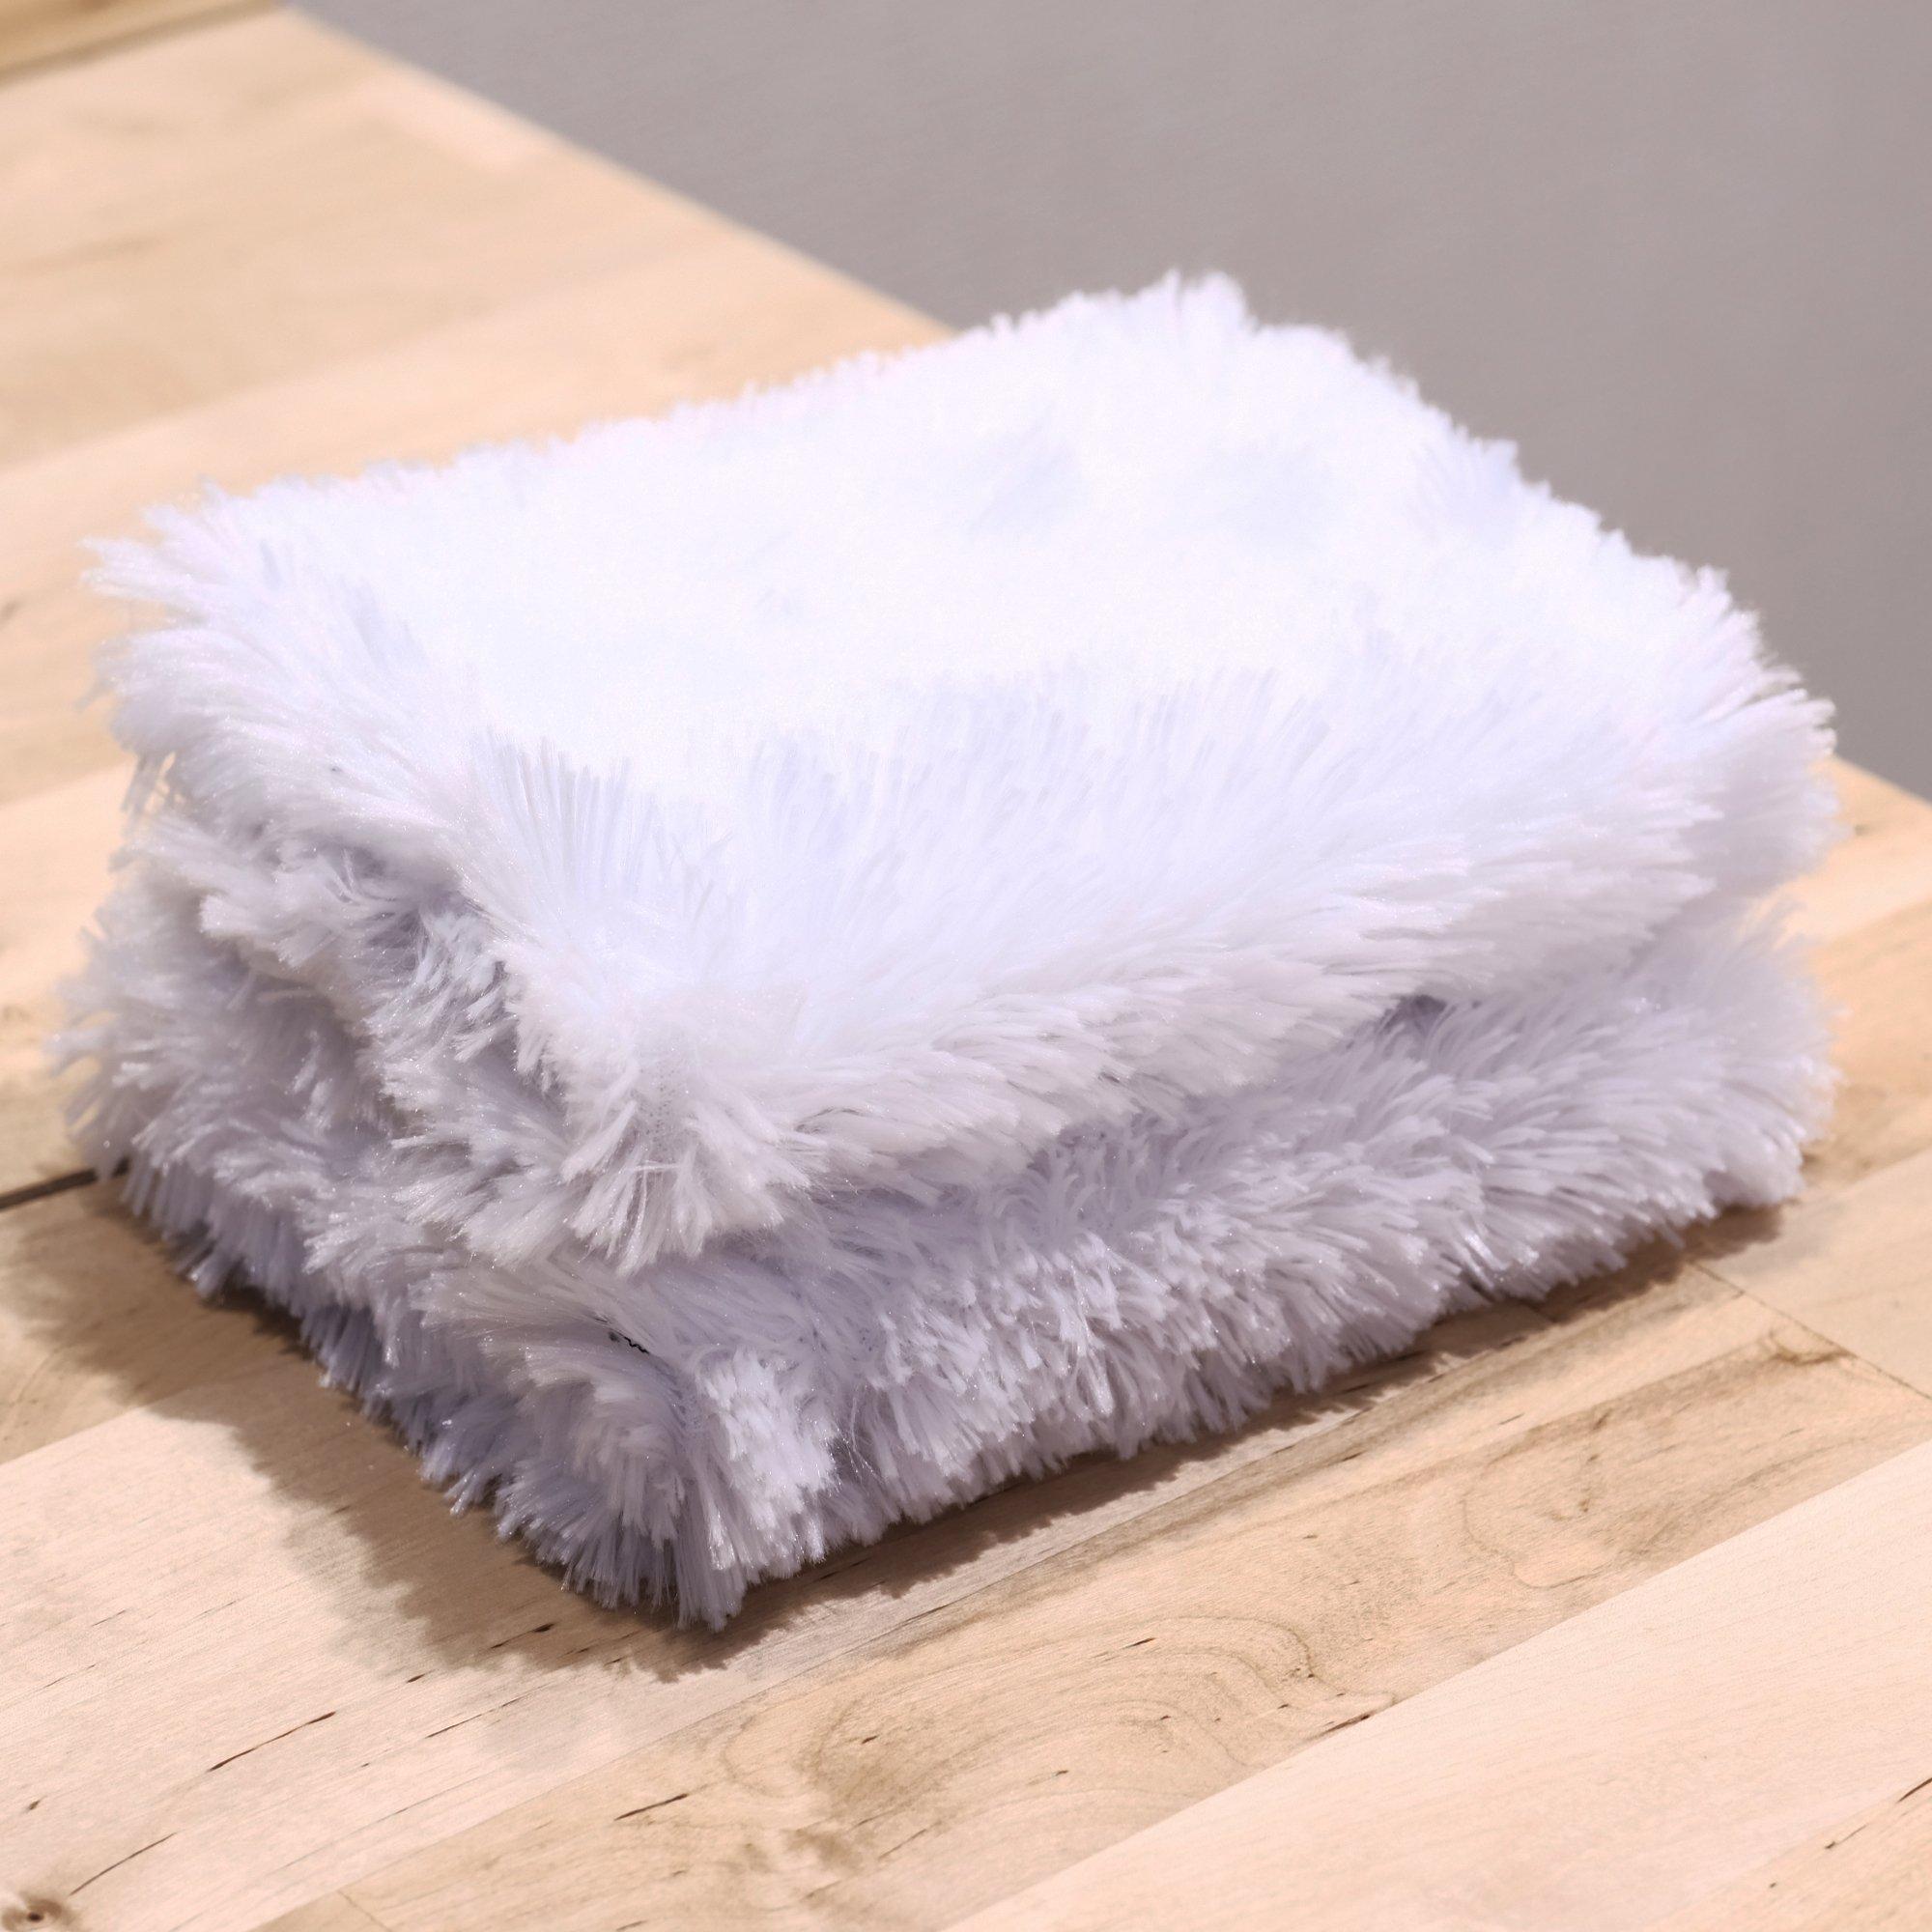 Microfiber Mop 18inch Velcro Wet & Dry Mop Refill for Hardwood Floors Set of 8 by Bear Family by Bear Family Microfiber (Image #7)